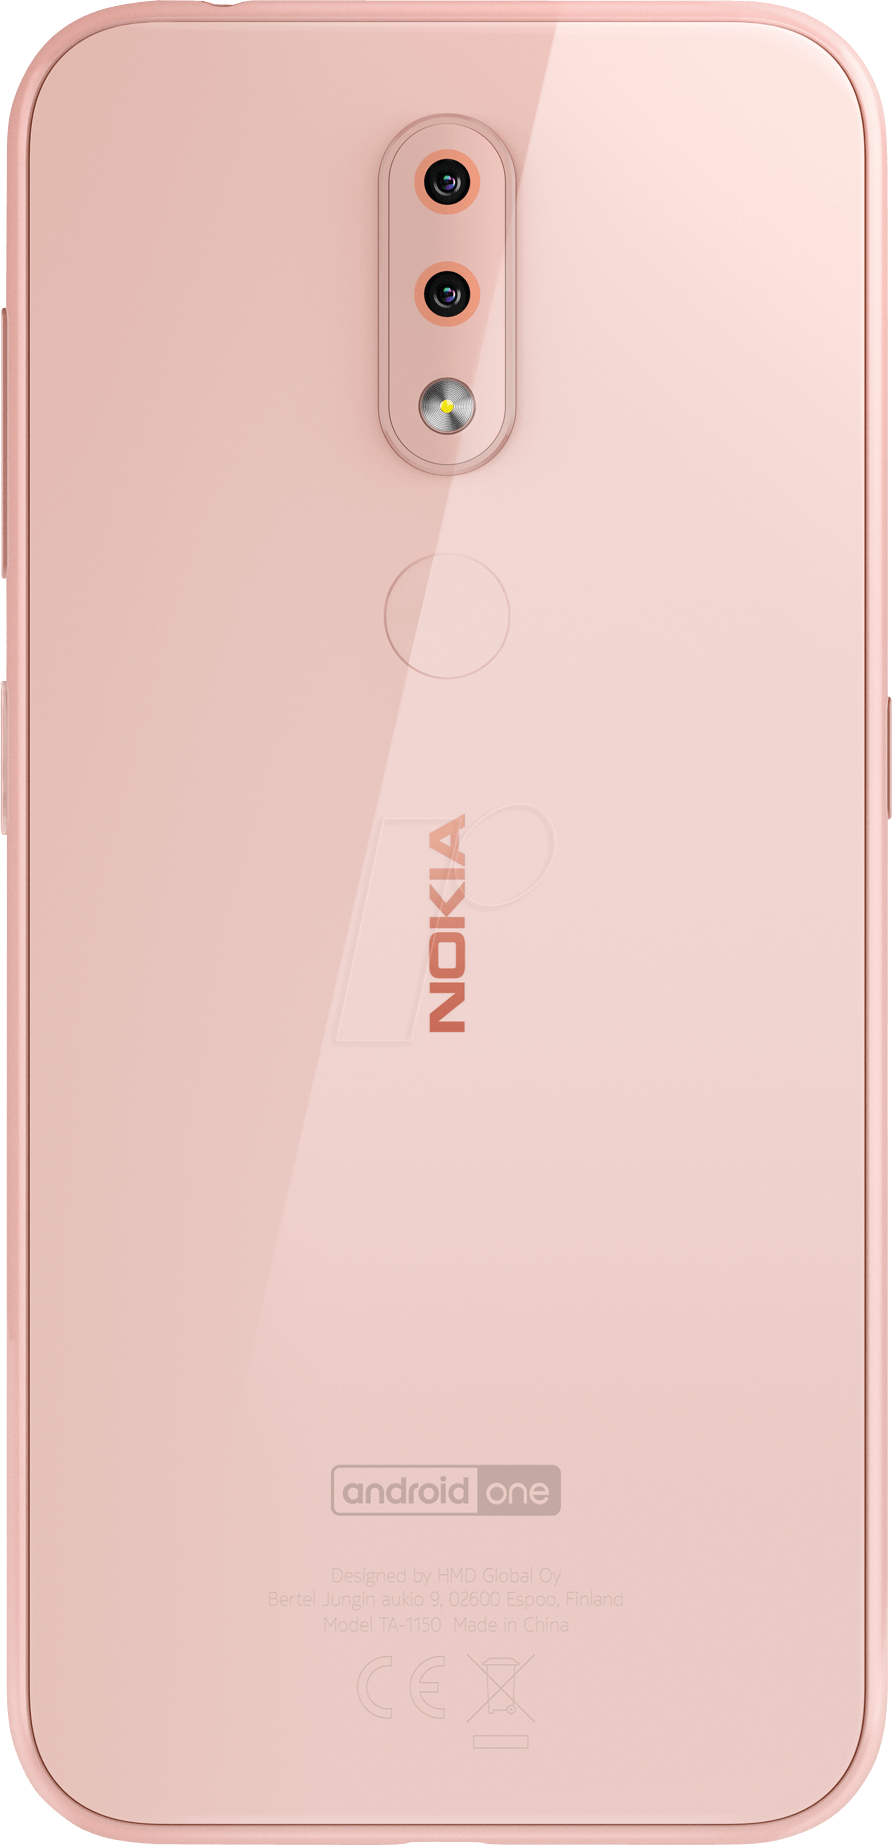 NOKIA 4 2SRS - Smartphone, 5 71